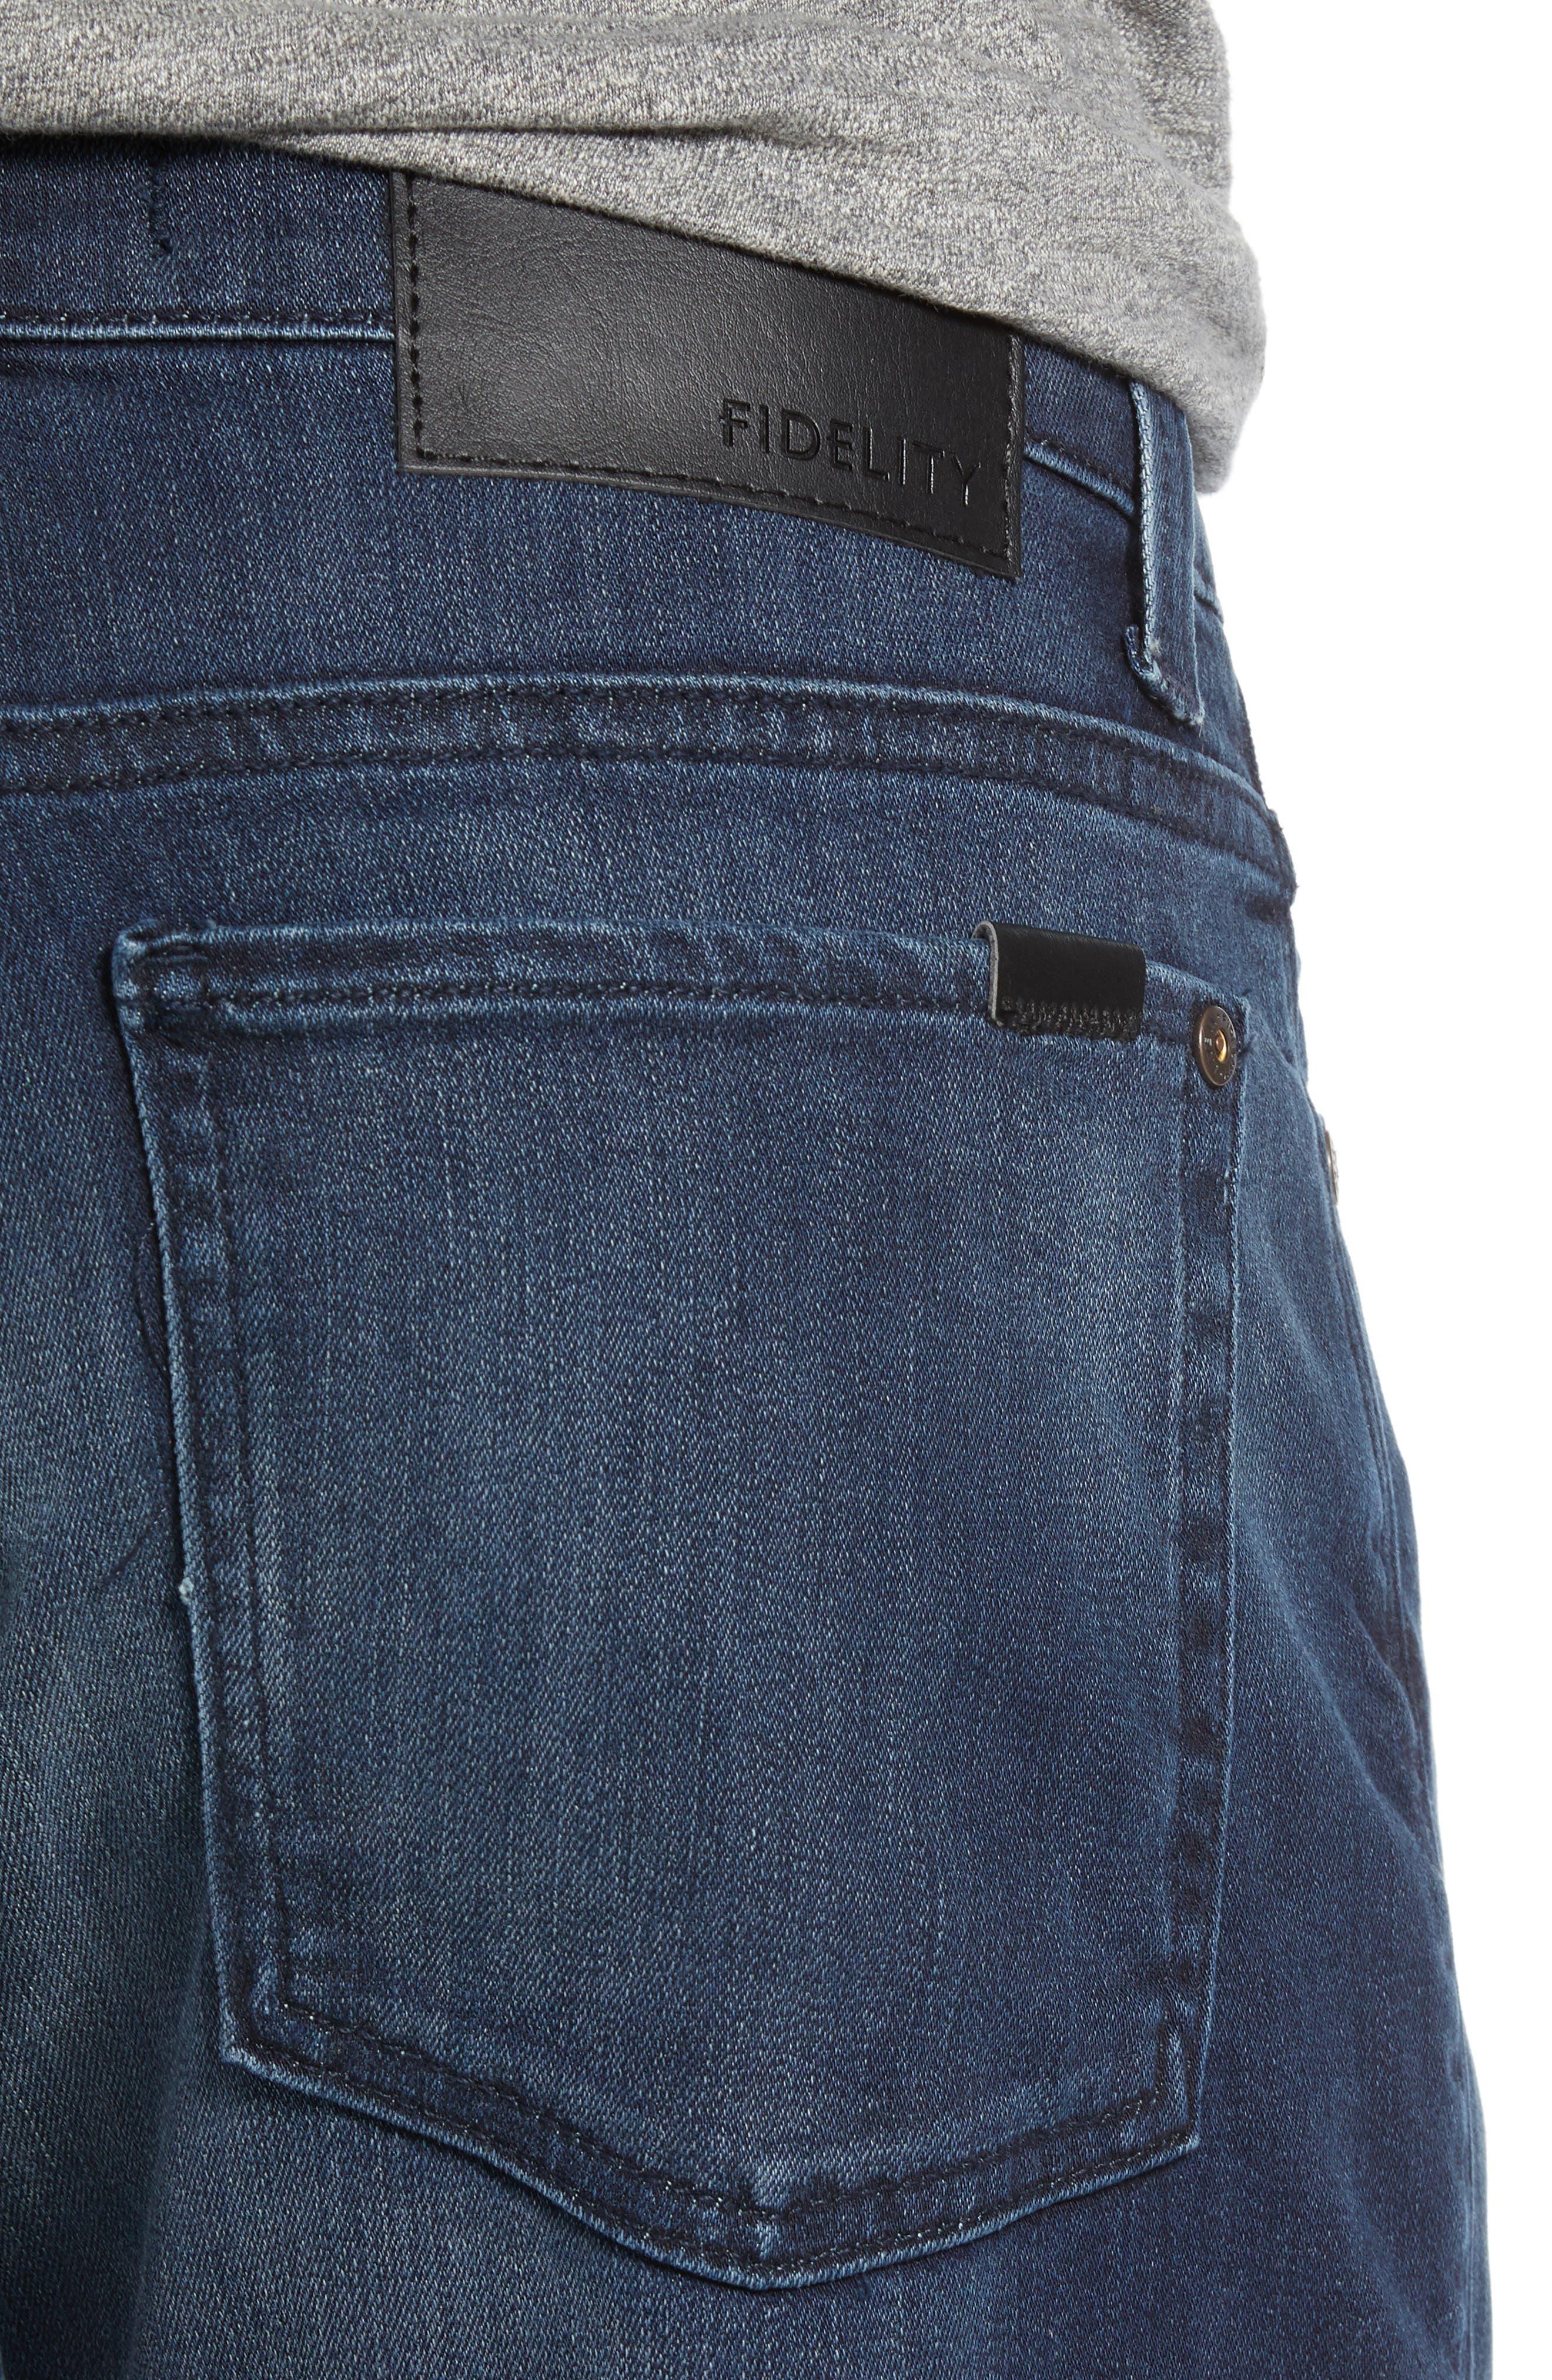 FIDELITY DENIM,                             Torino Slim Fit Jeans,                             Alternate thumbnail 4, color,                             SPECTRE